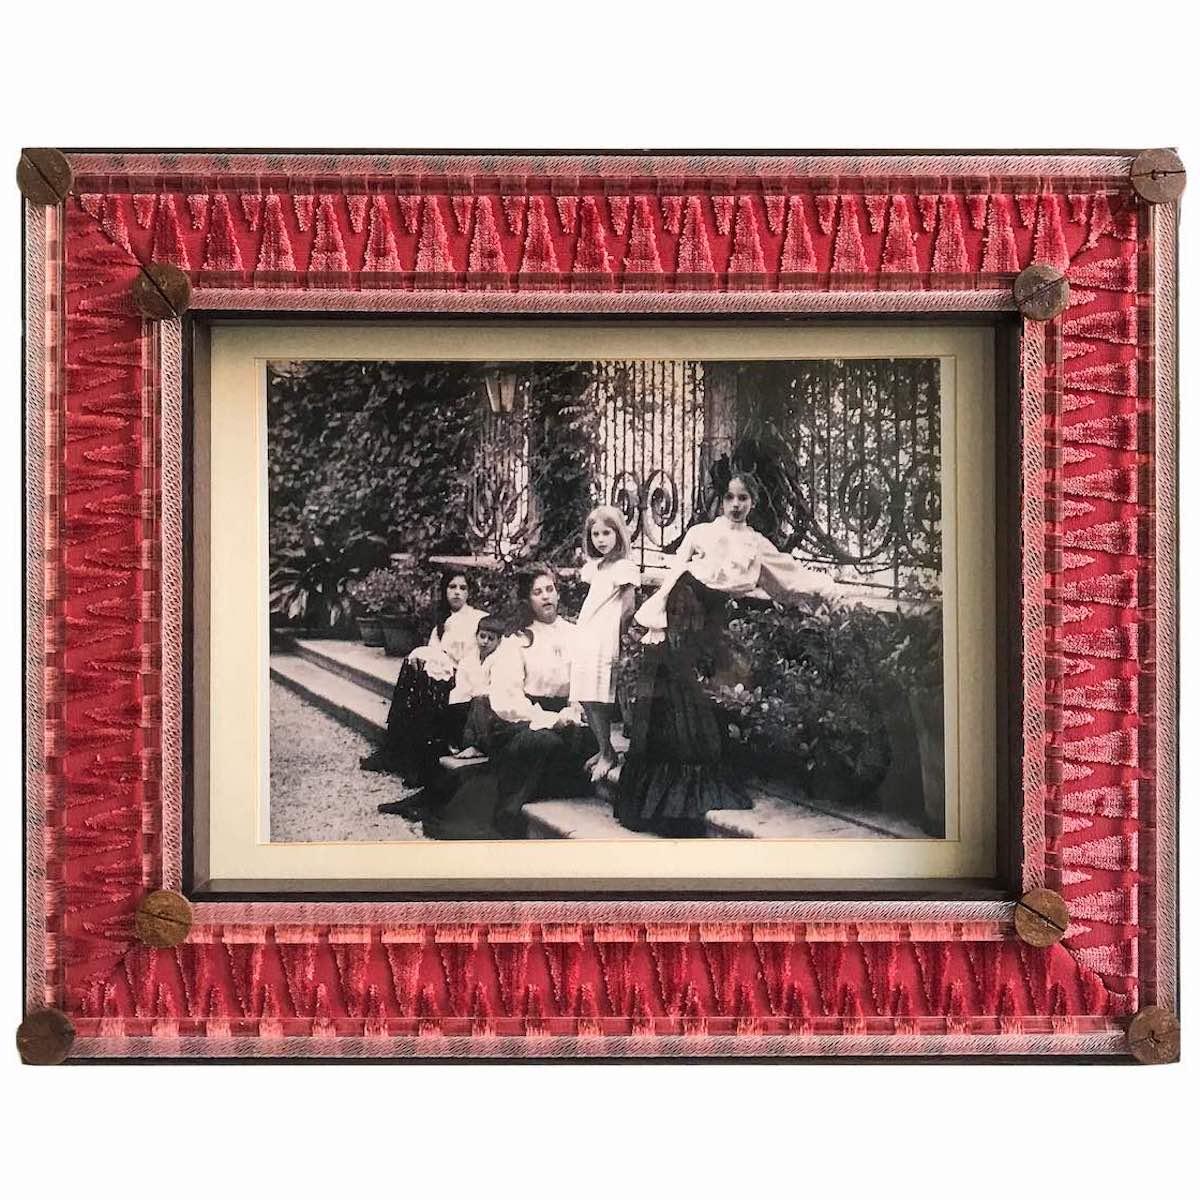 madda-bevilacqua-frame-picture-luxury-silk-velvet-red